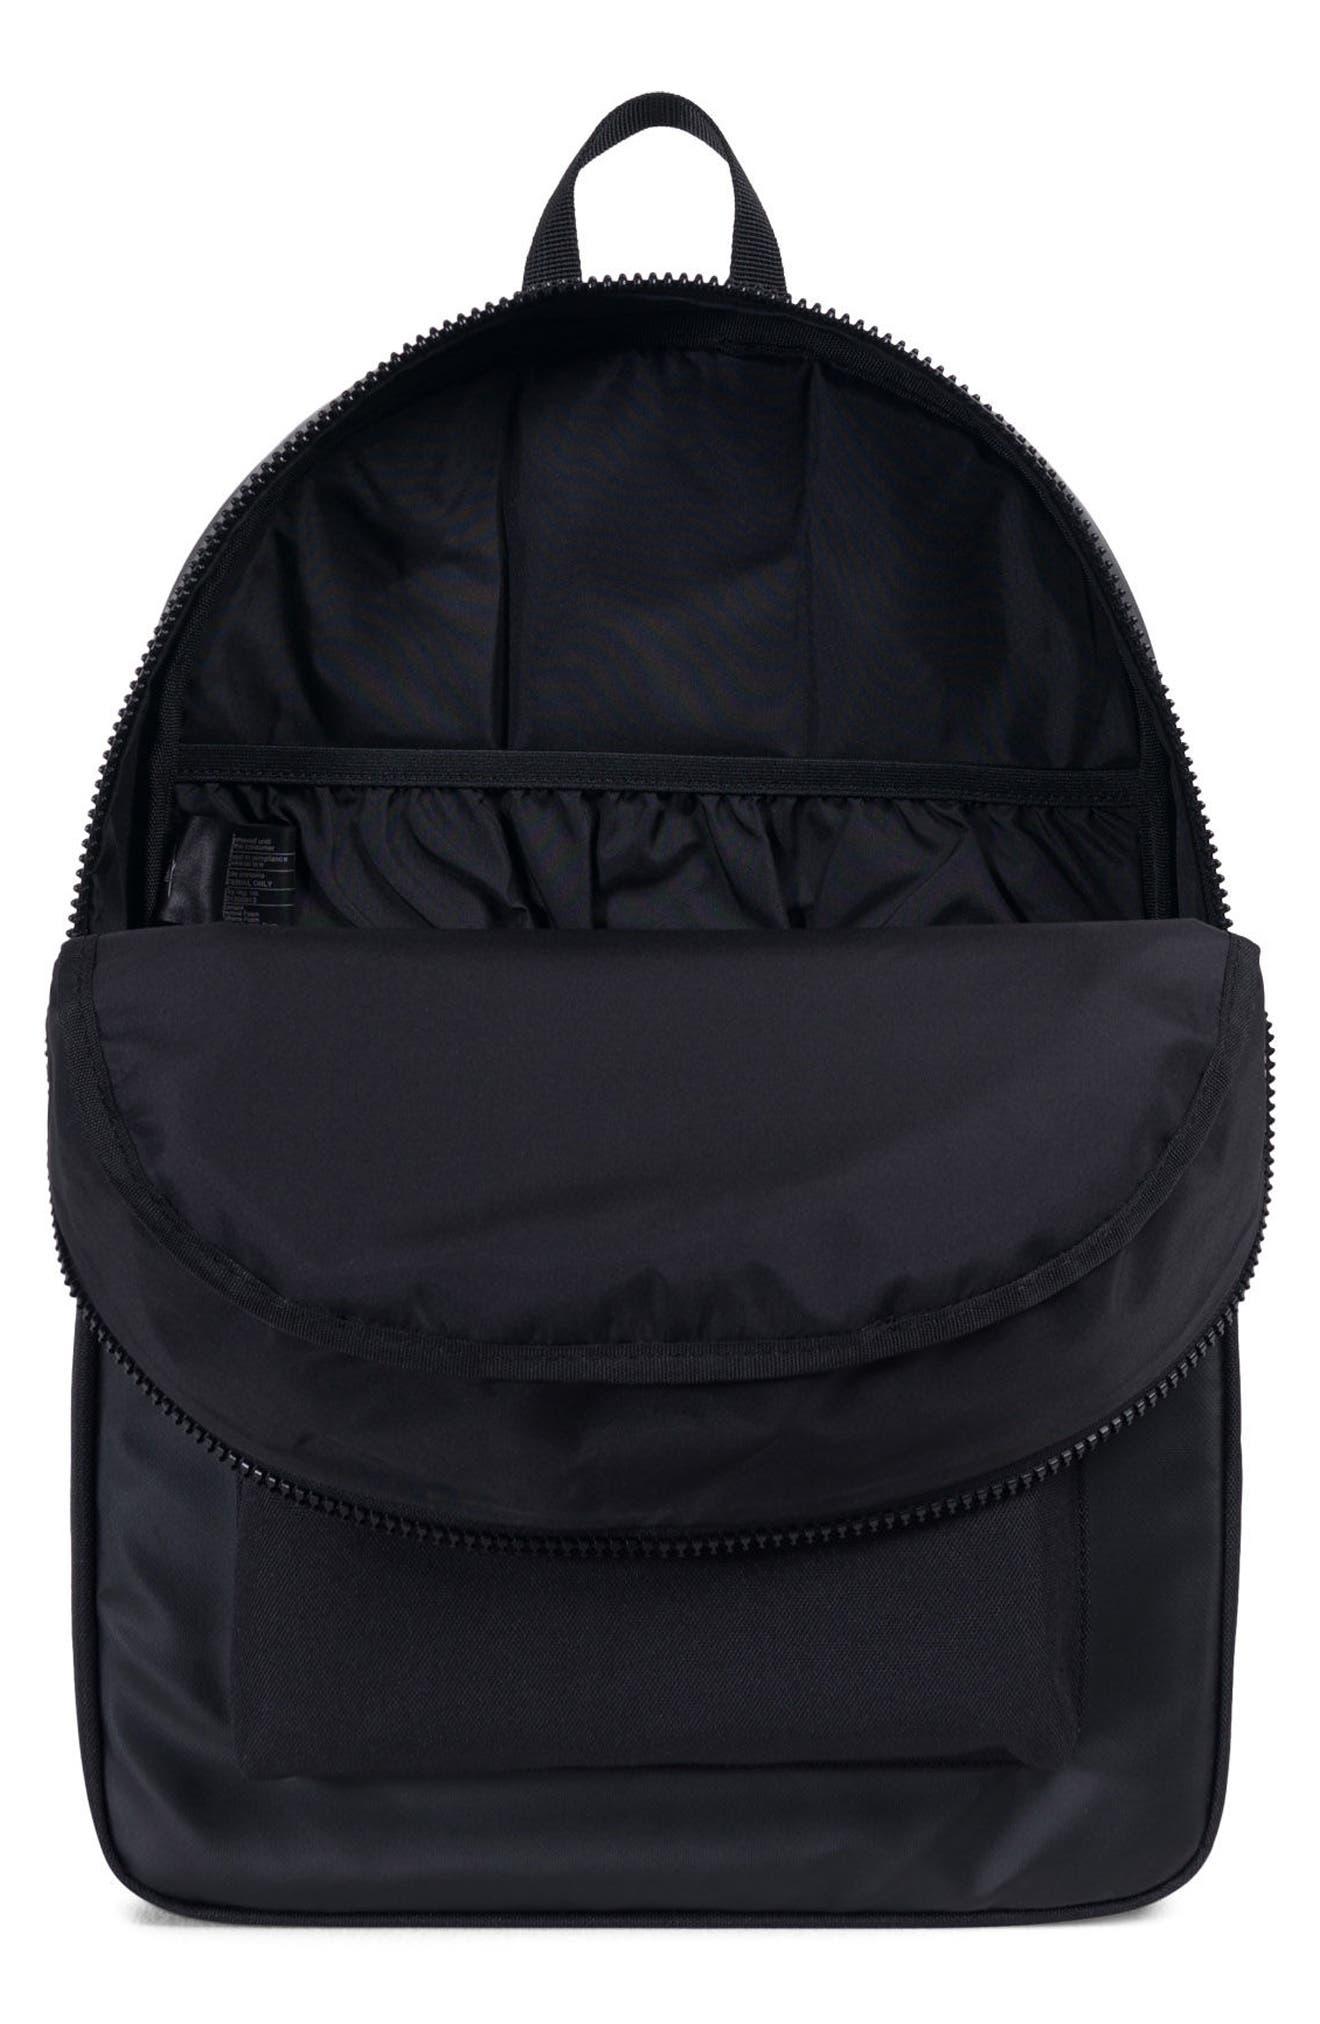 Winlaw Polycoat Studio Backpack,                             Alternate thumbnail 3, color,                             Black